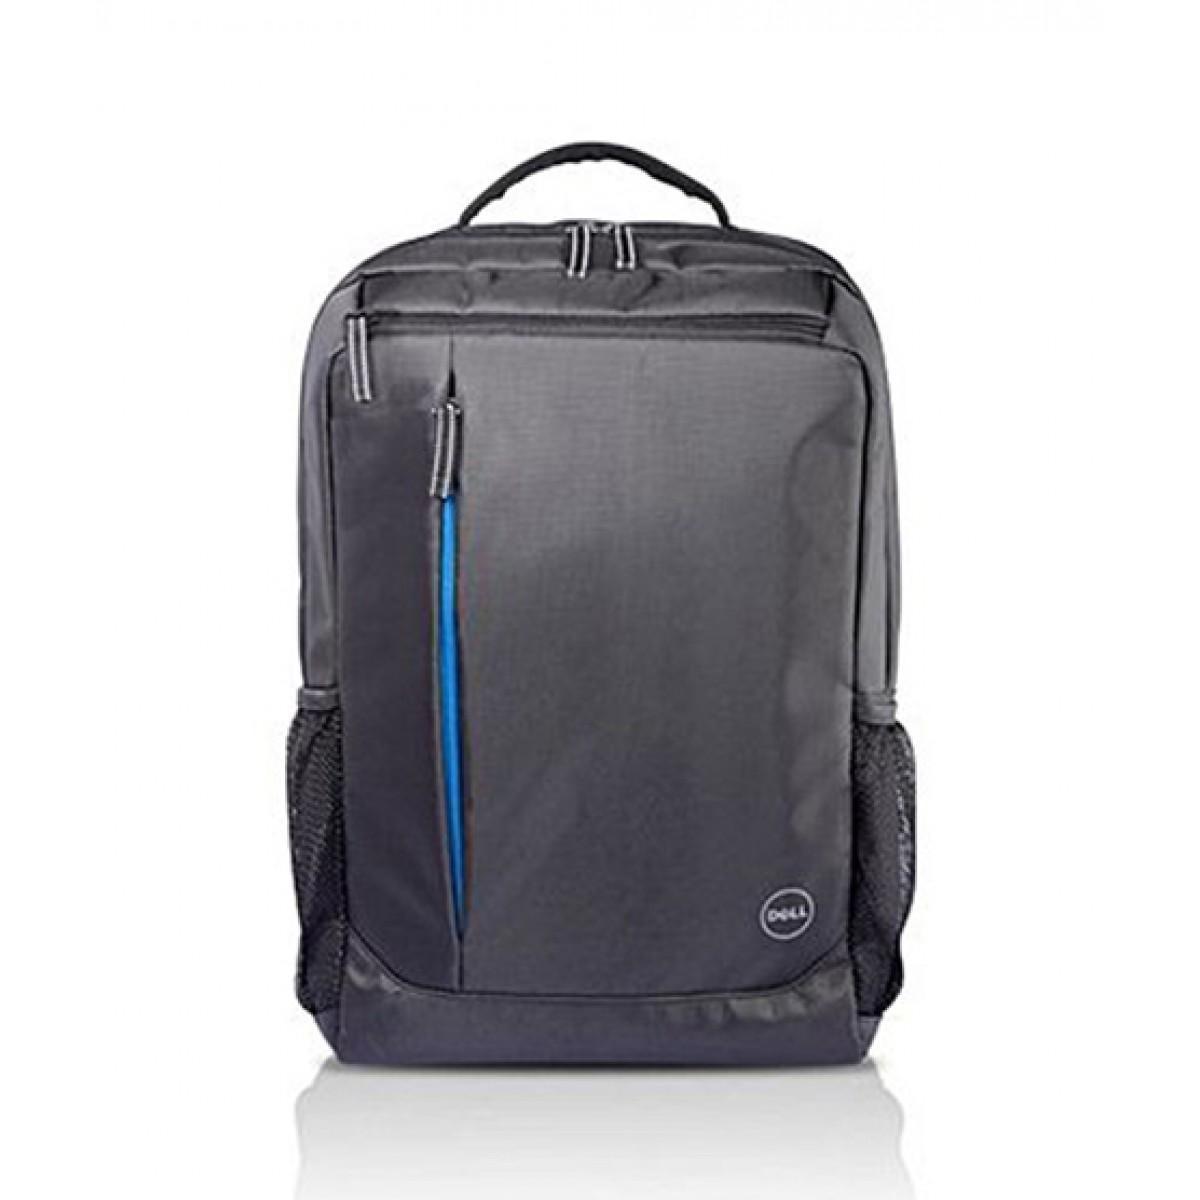 Dell Essential Backpack-15 Laptop Bag: Buy Sell Online @ Best Prices in  SriLanka   Daraz.lk